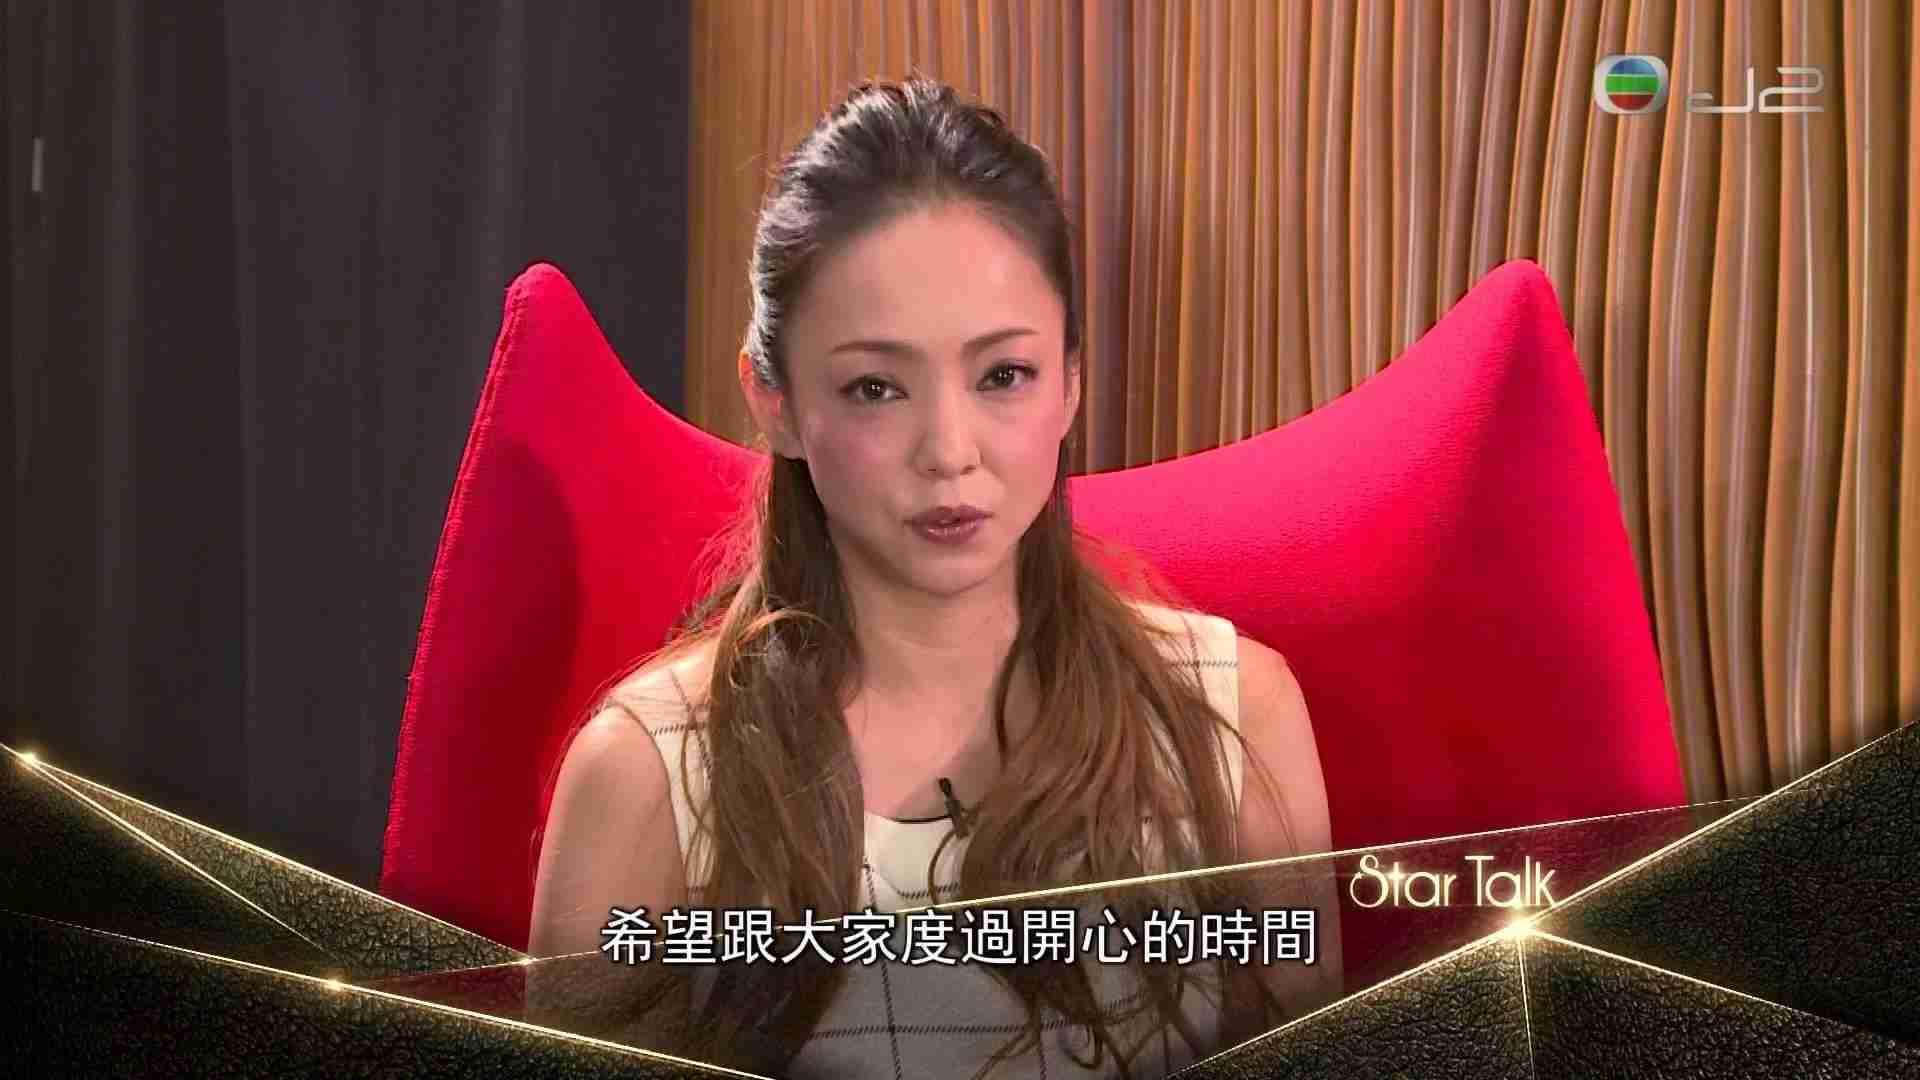 Namie Amuro 安室奈美恵 | Hong Kong Star Talk Interview | Nov 16 2015 - YouTube